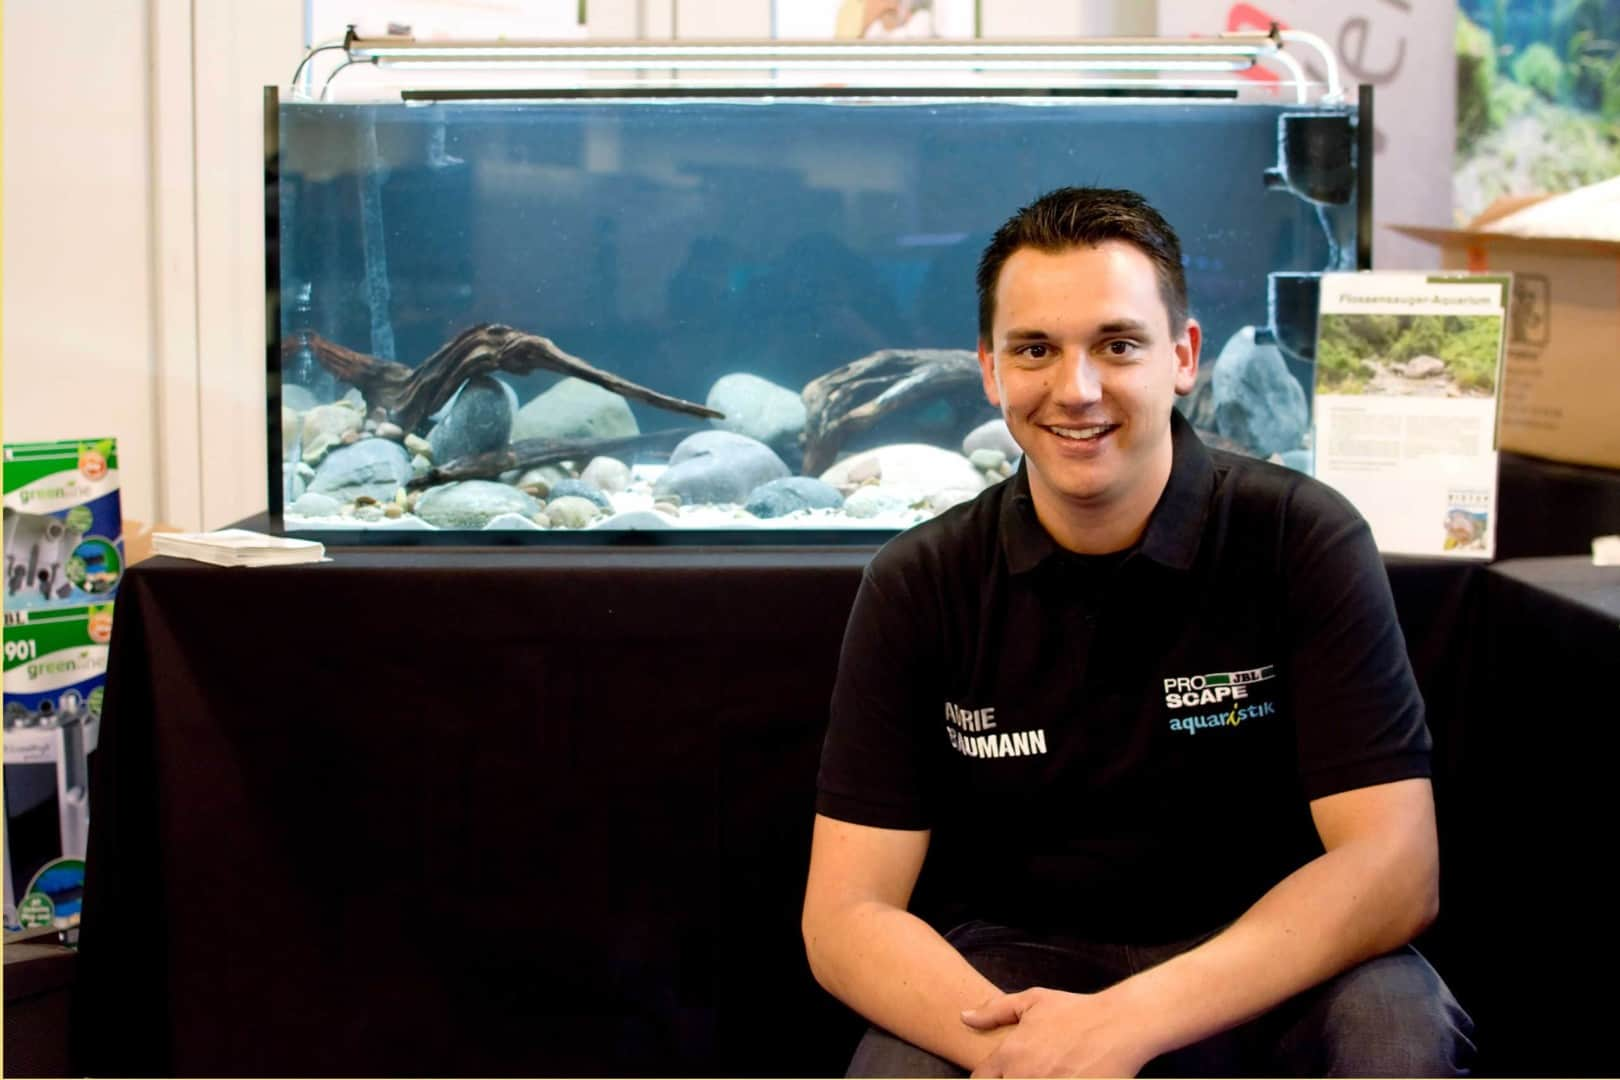 German Biotope Aquarium Contest (GBAC) - Mach mit! 5